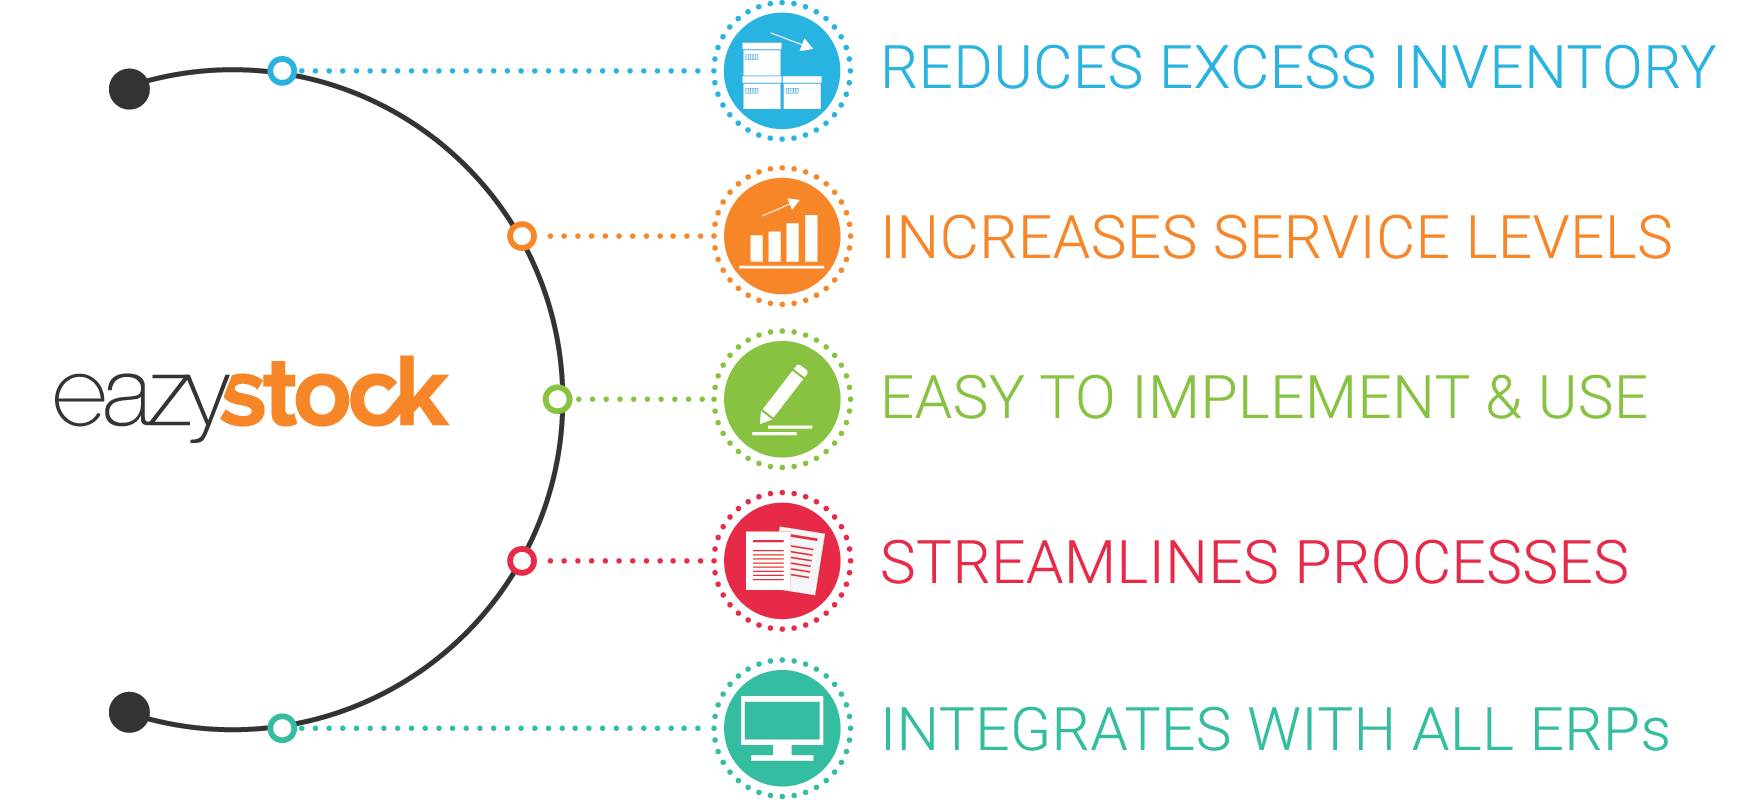 Learn how EazyStock can help